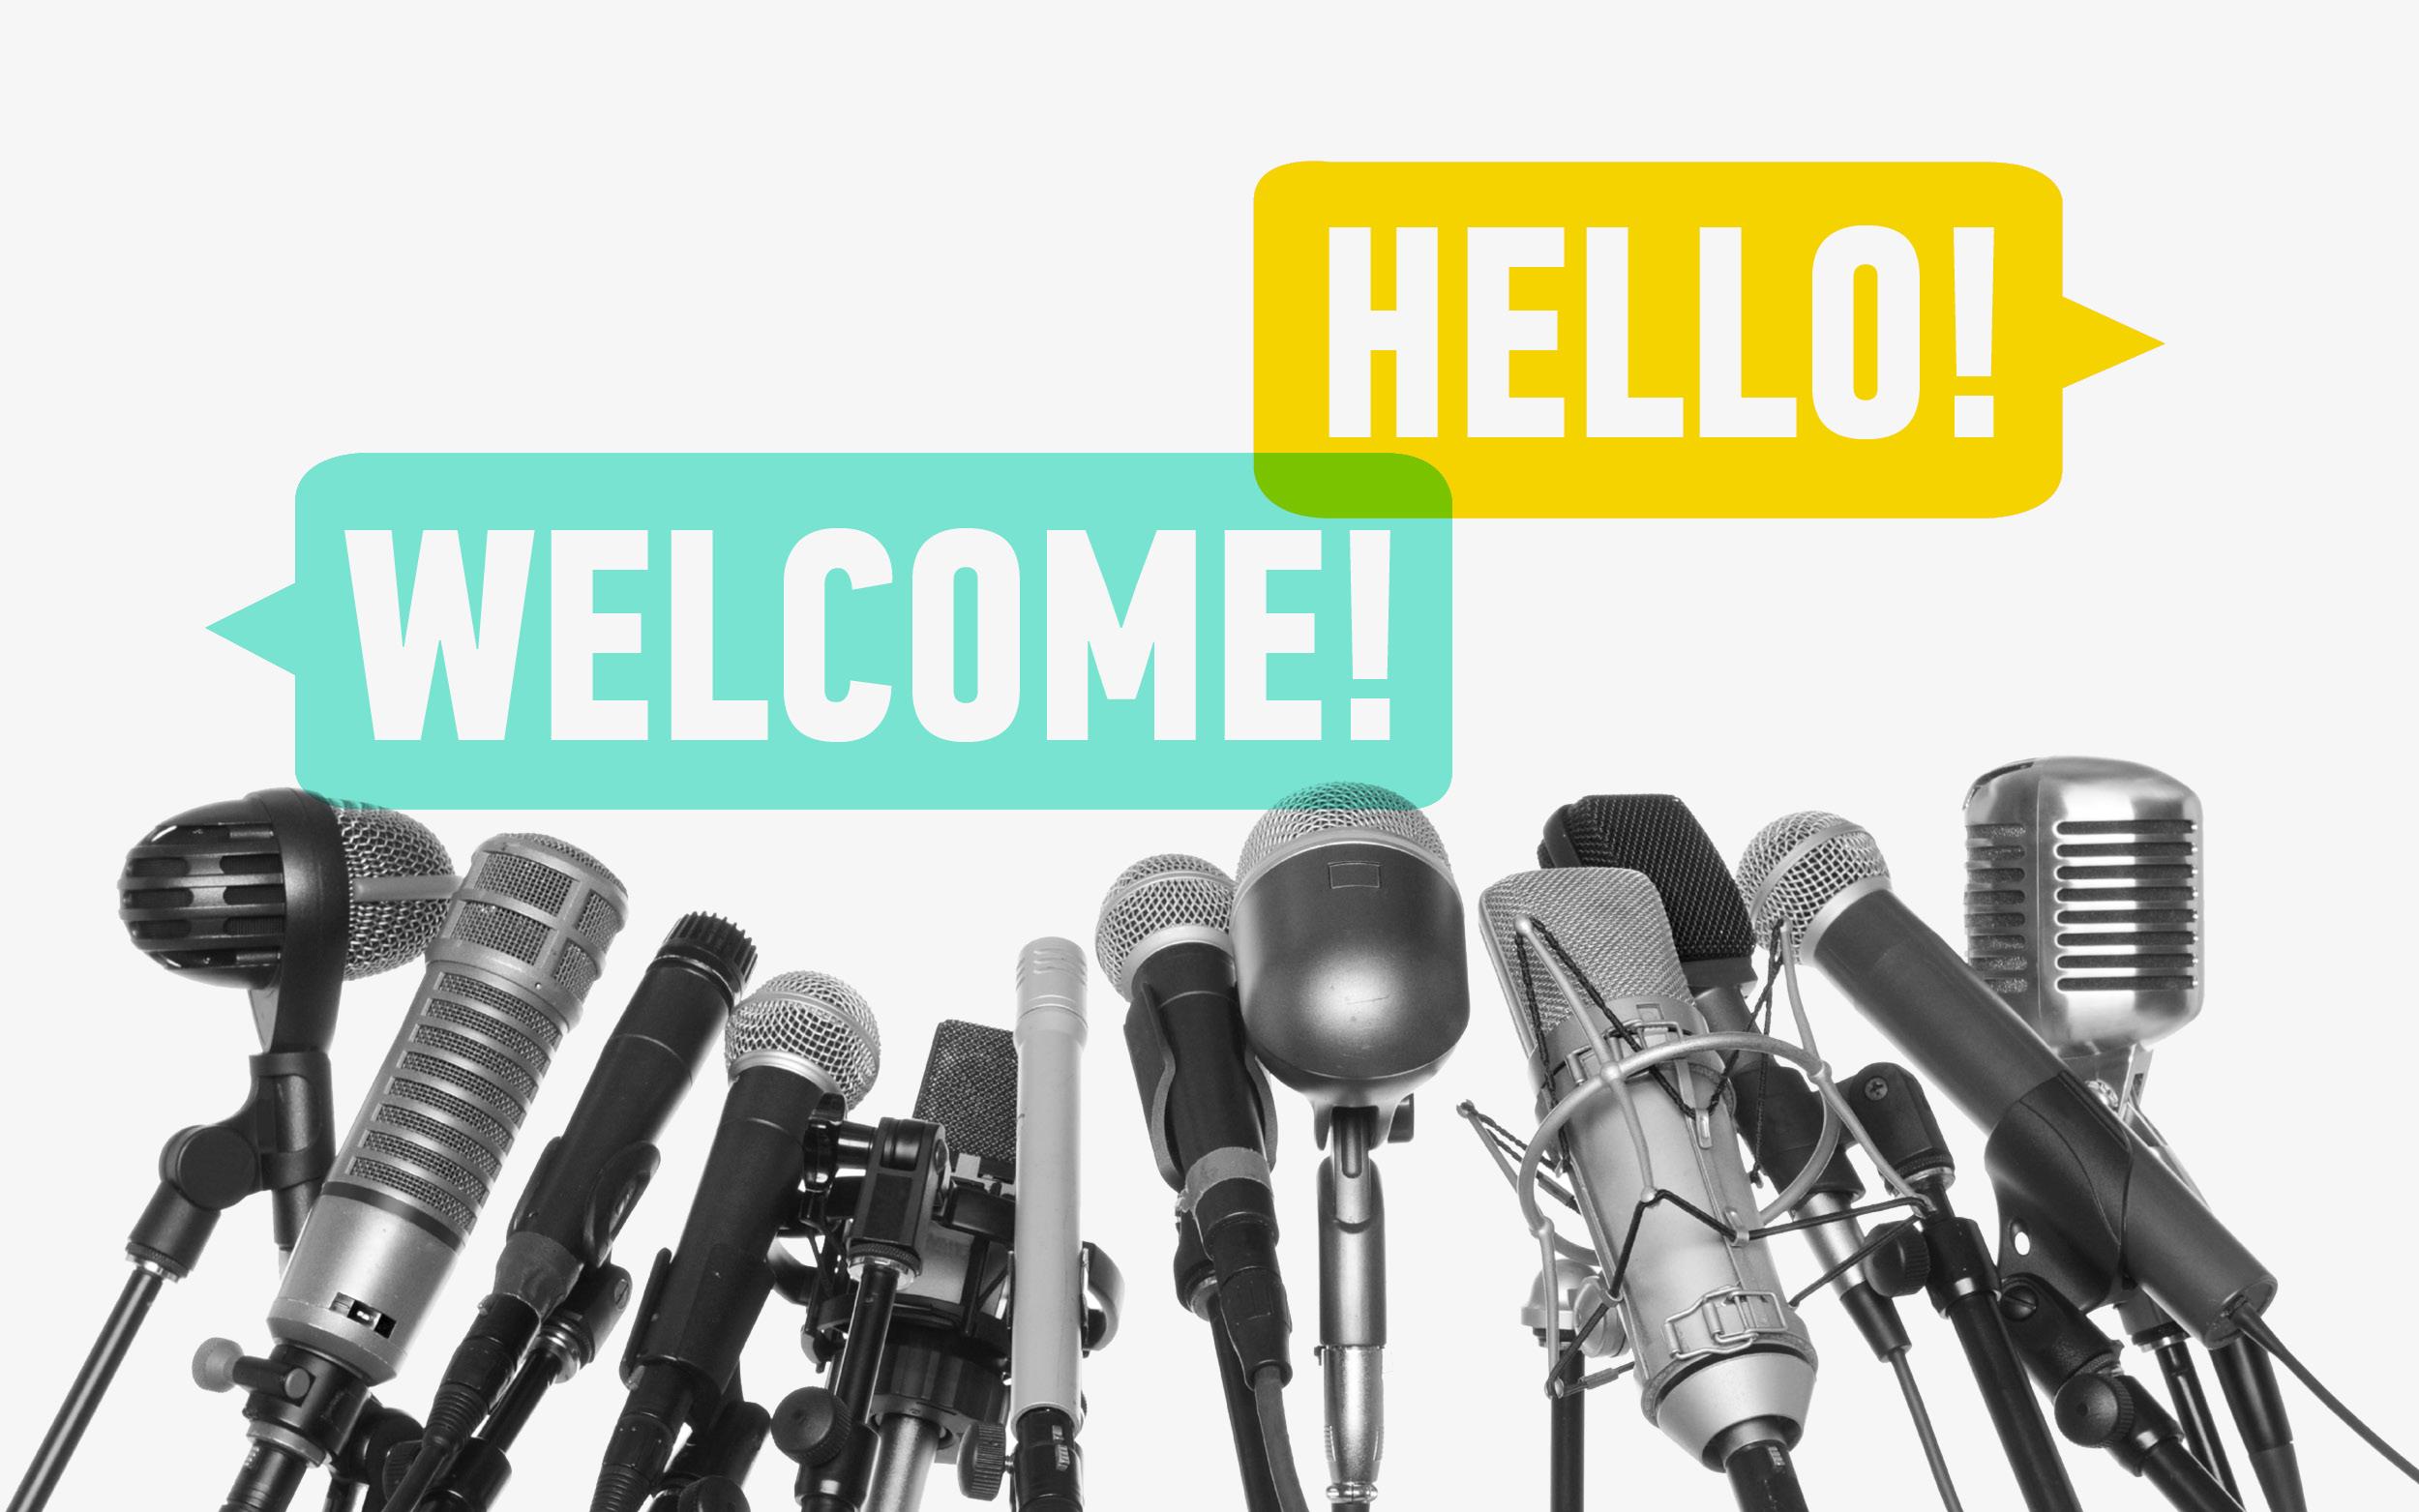 Intro to the Ohio Startup Community